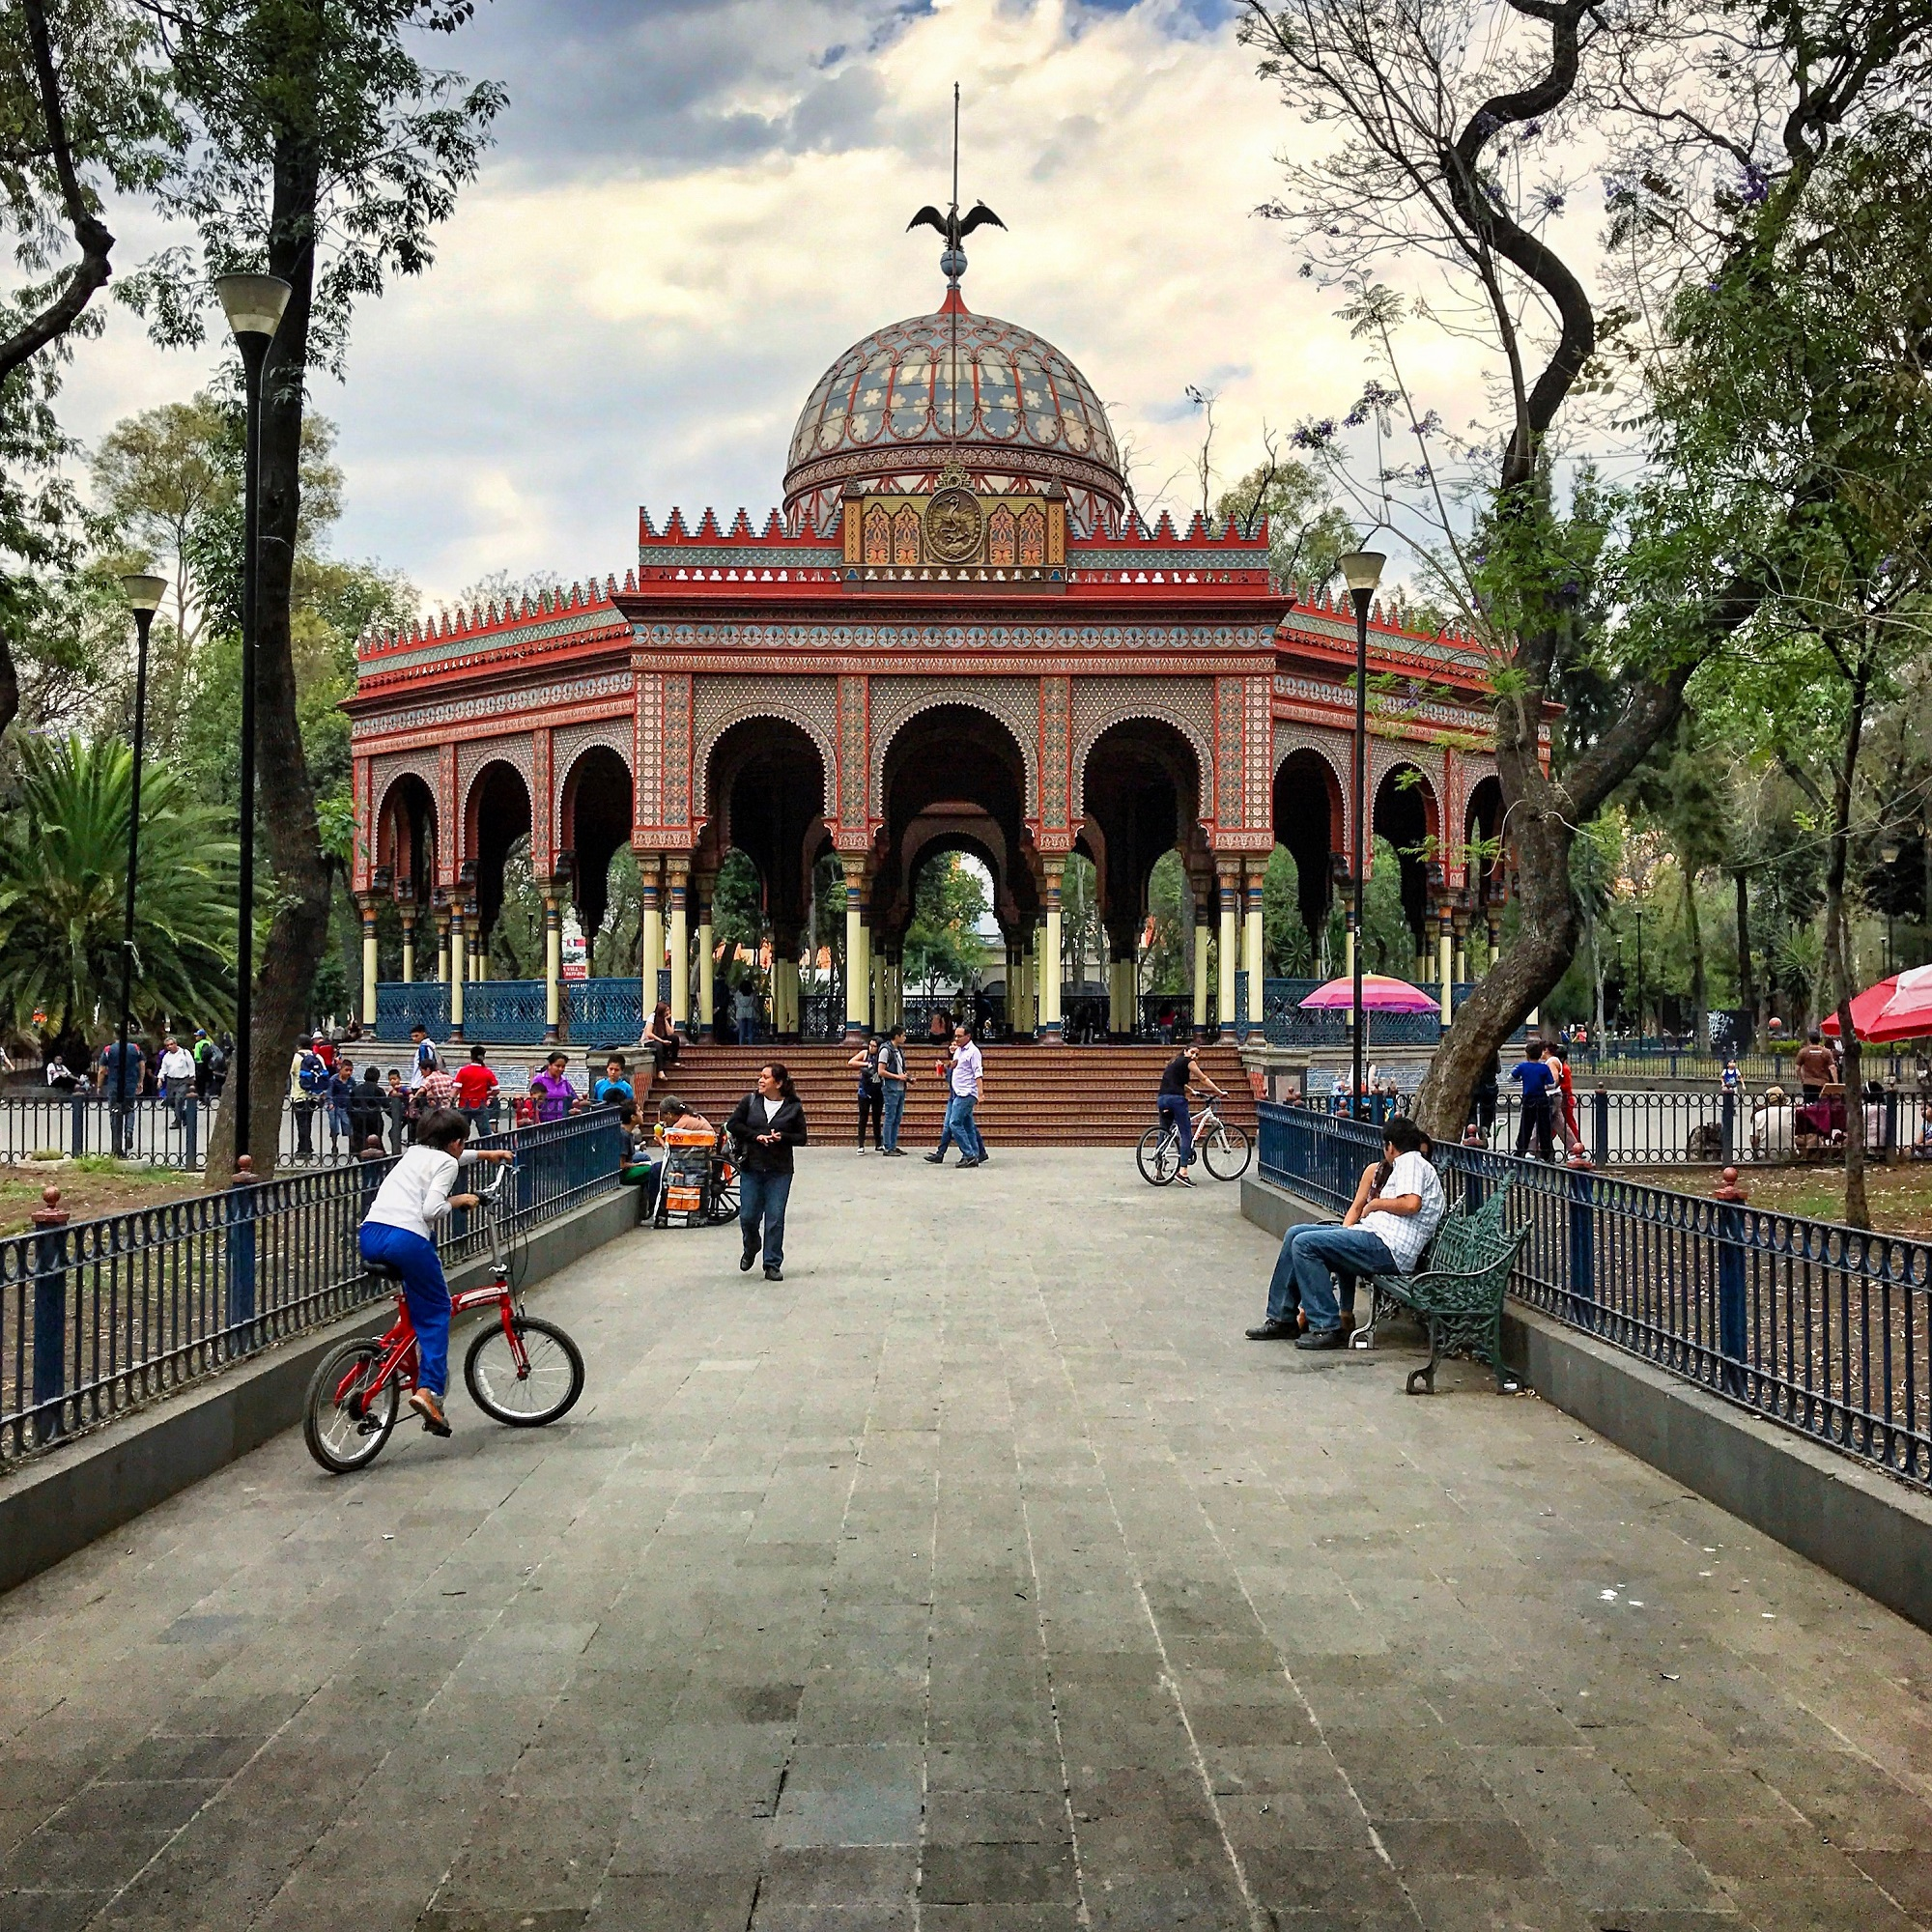 Dating in mexico city Santa Maria